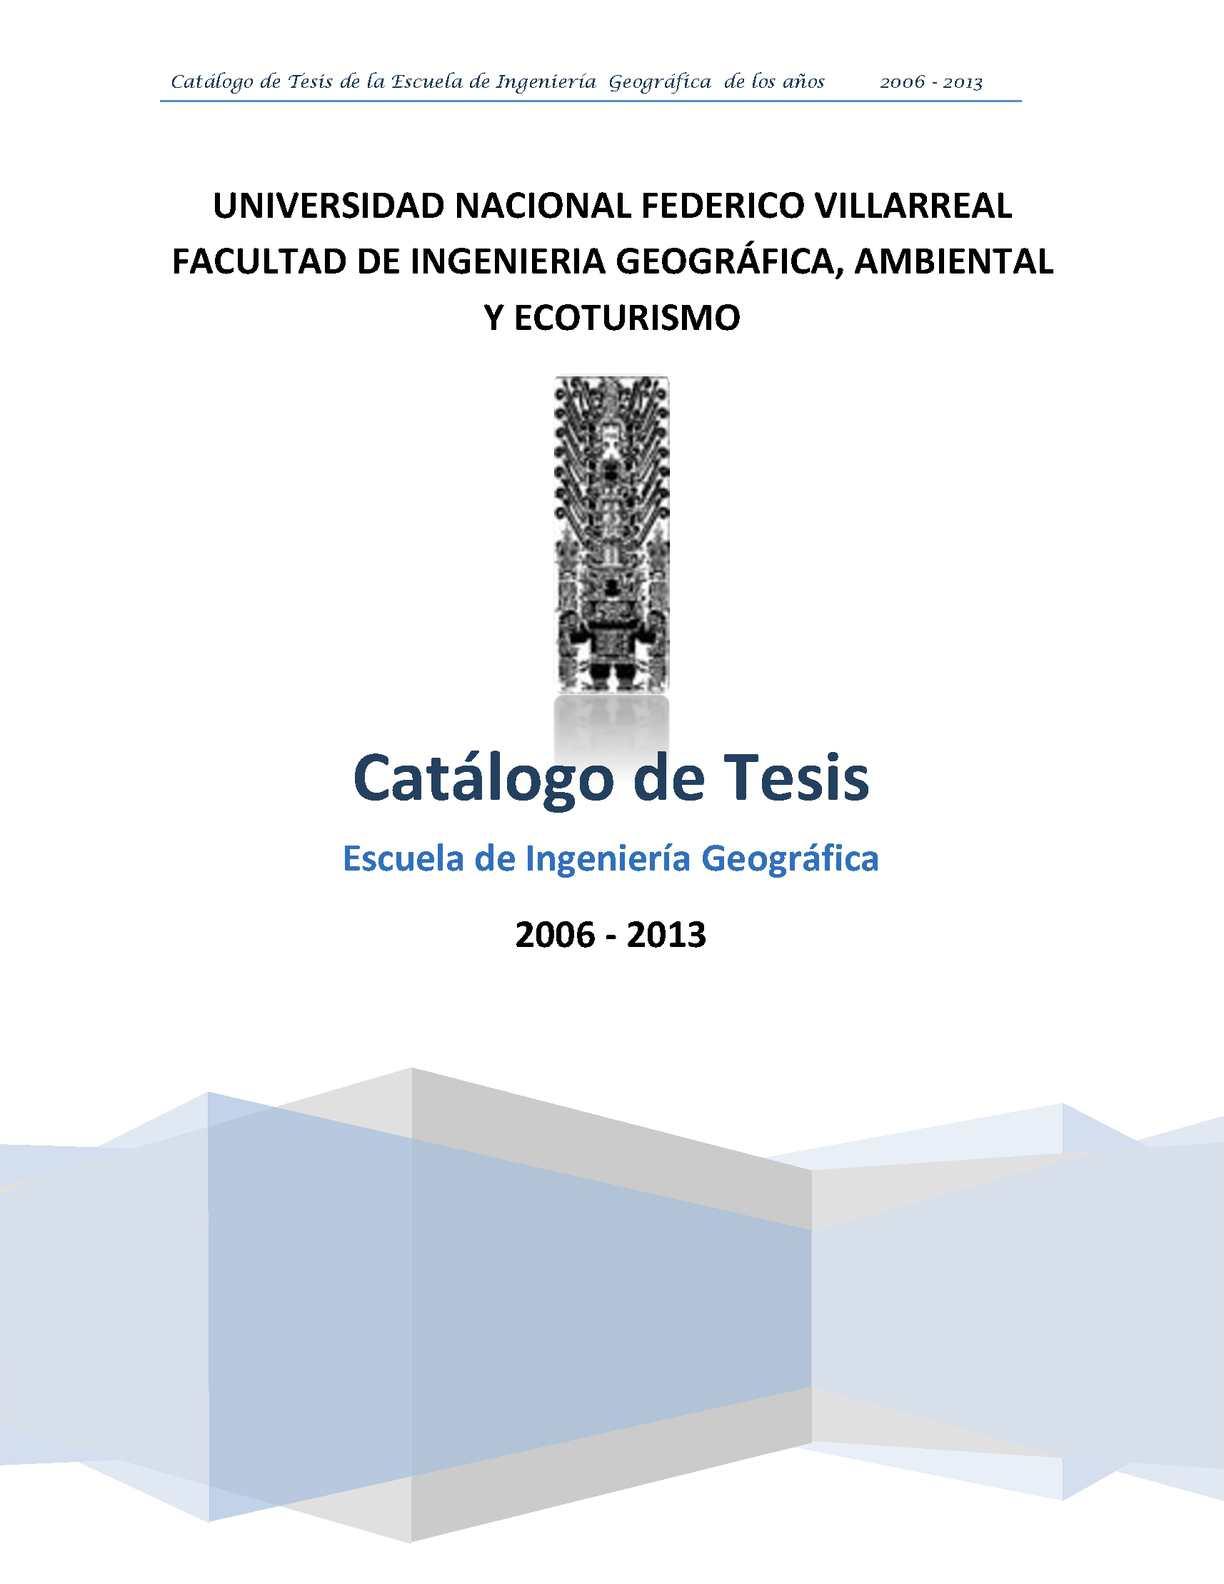 Calaméo - Tomo IV Catálogo de Tesis 2006 2013 Ing. Geografica